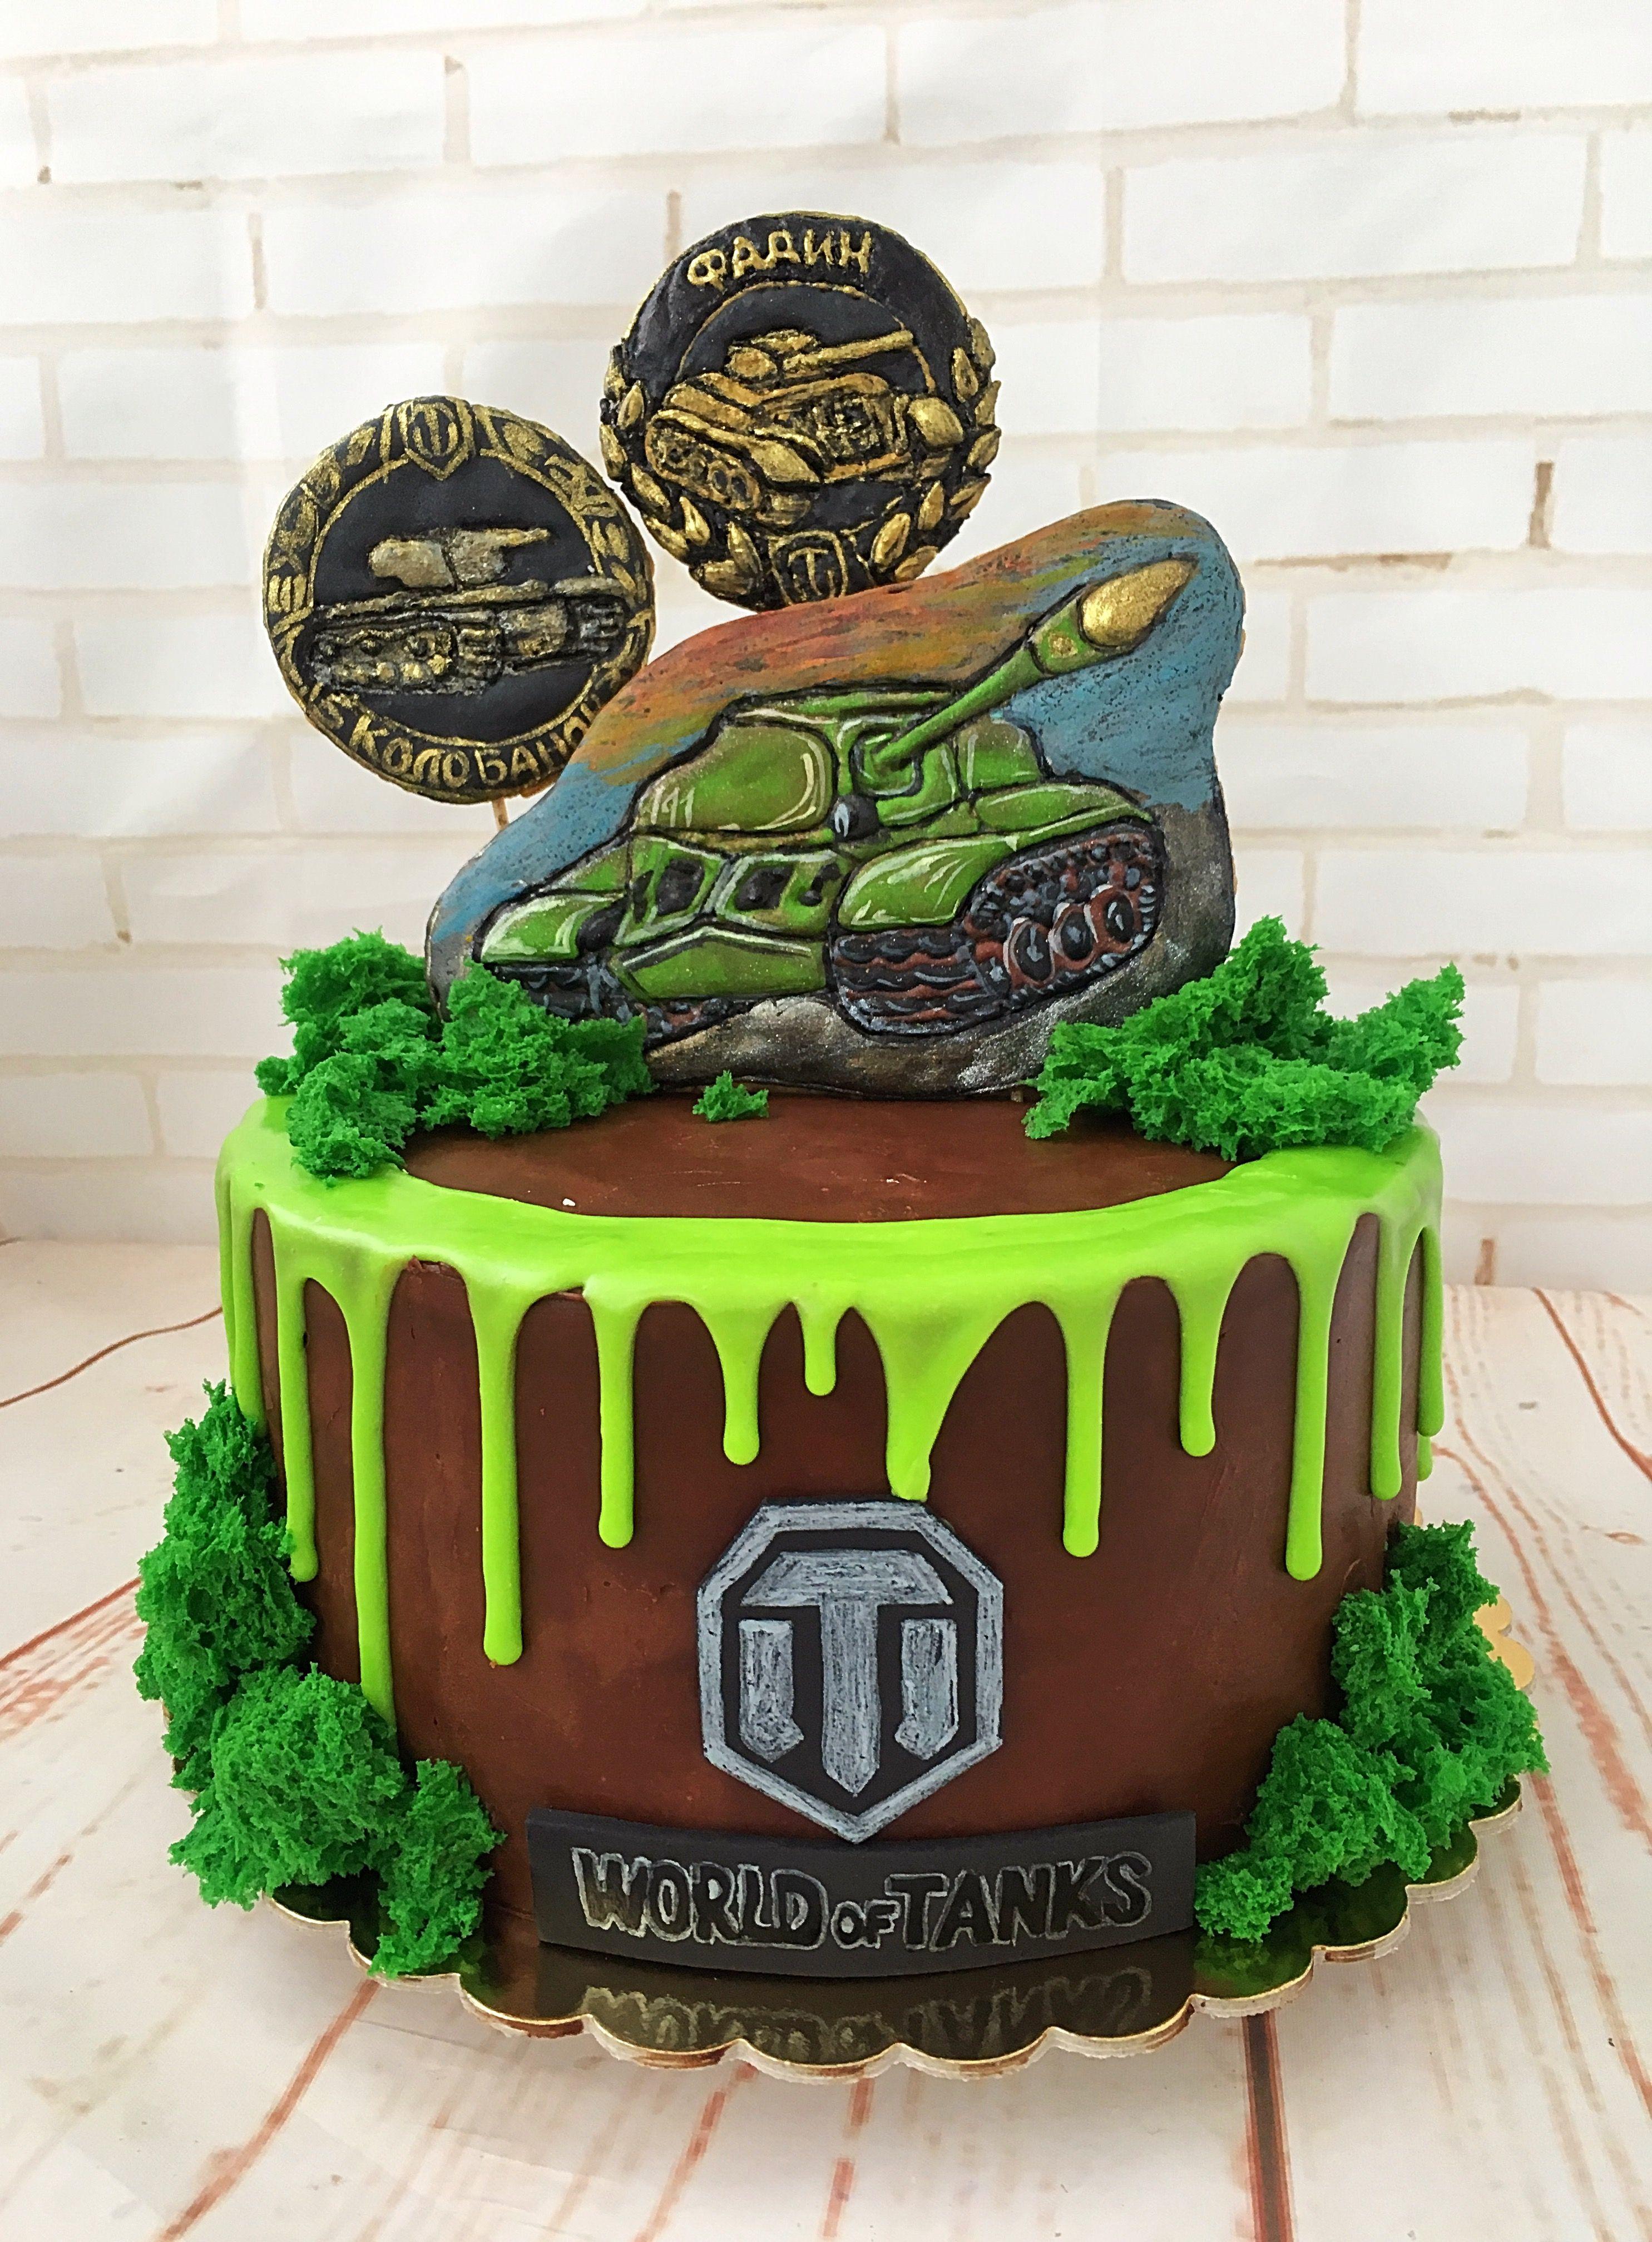 Image result for birthday cake world of tanks